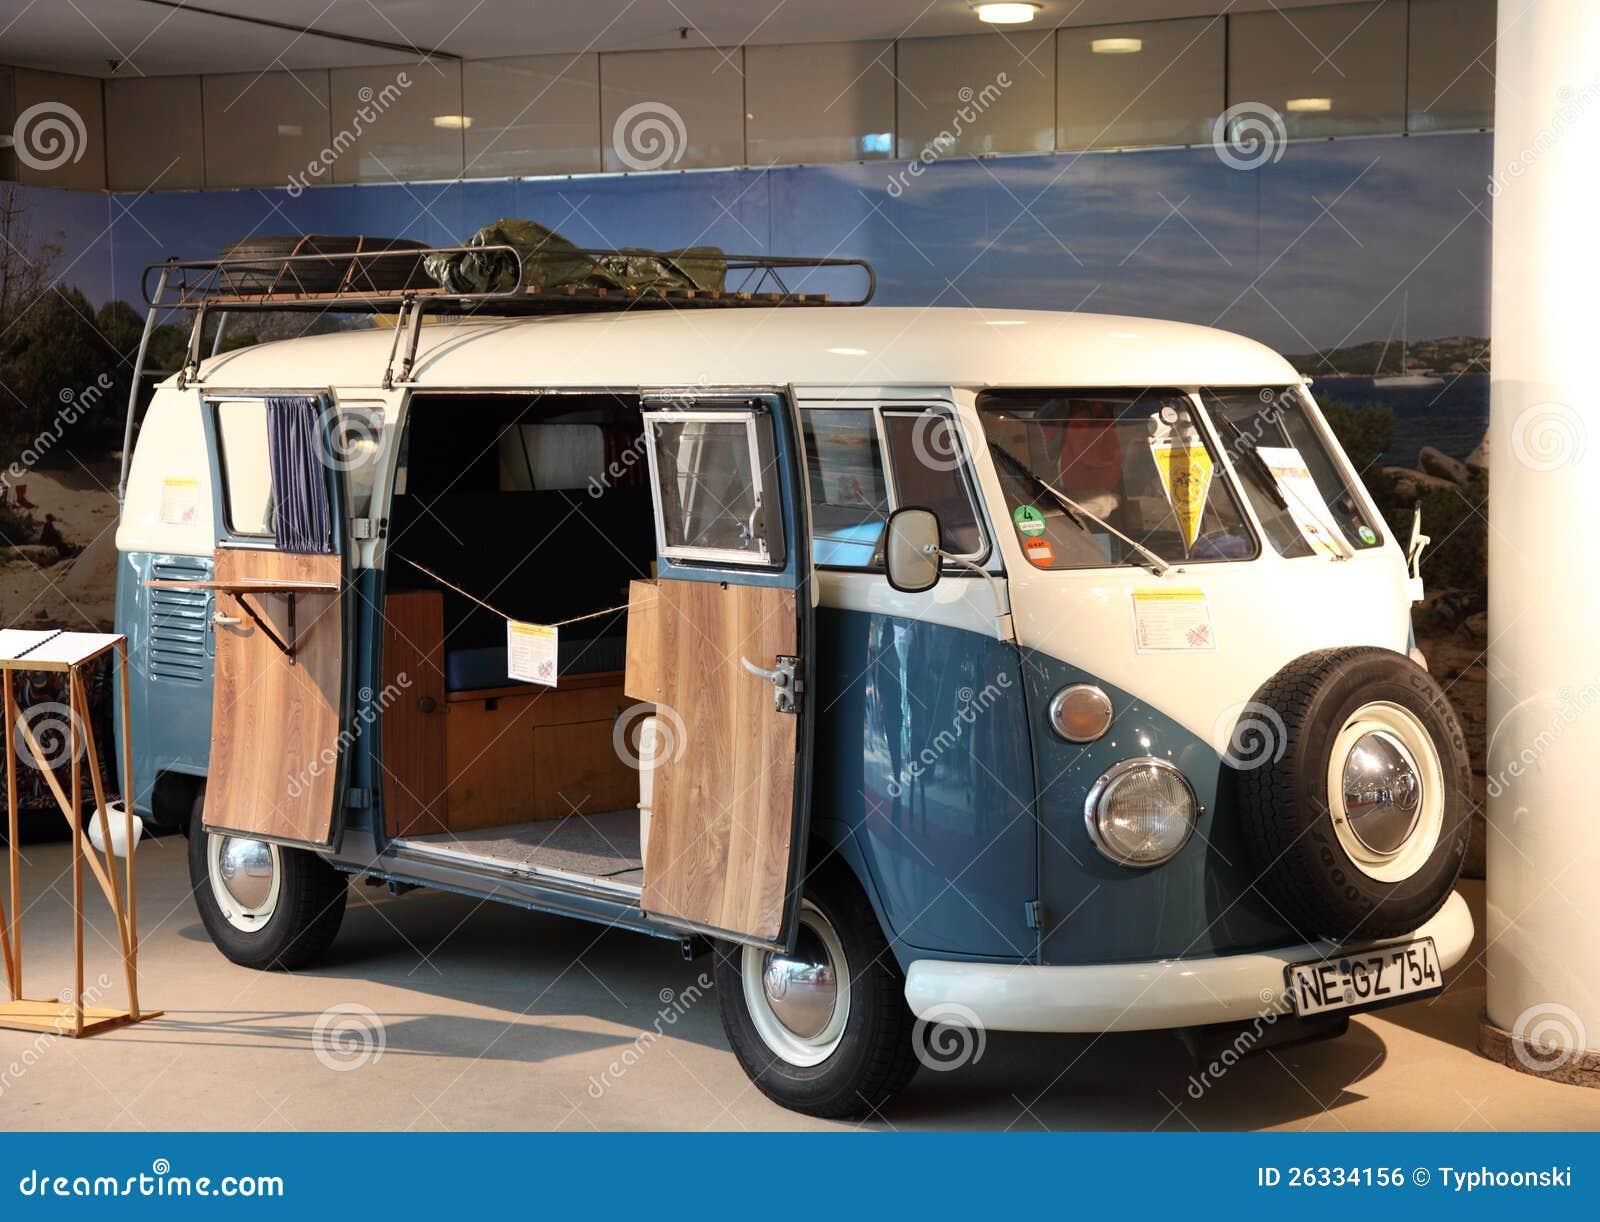 type de volkswagen camping car 2 photo ditorial image 26334156. Black Bedroom Furniture Sets. Home Design Ideas